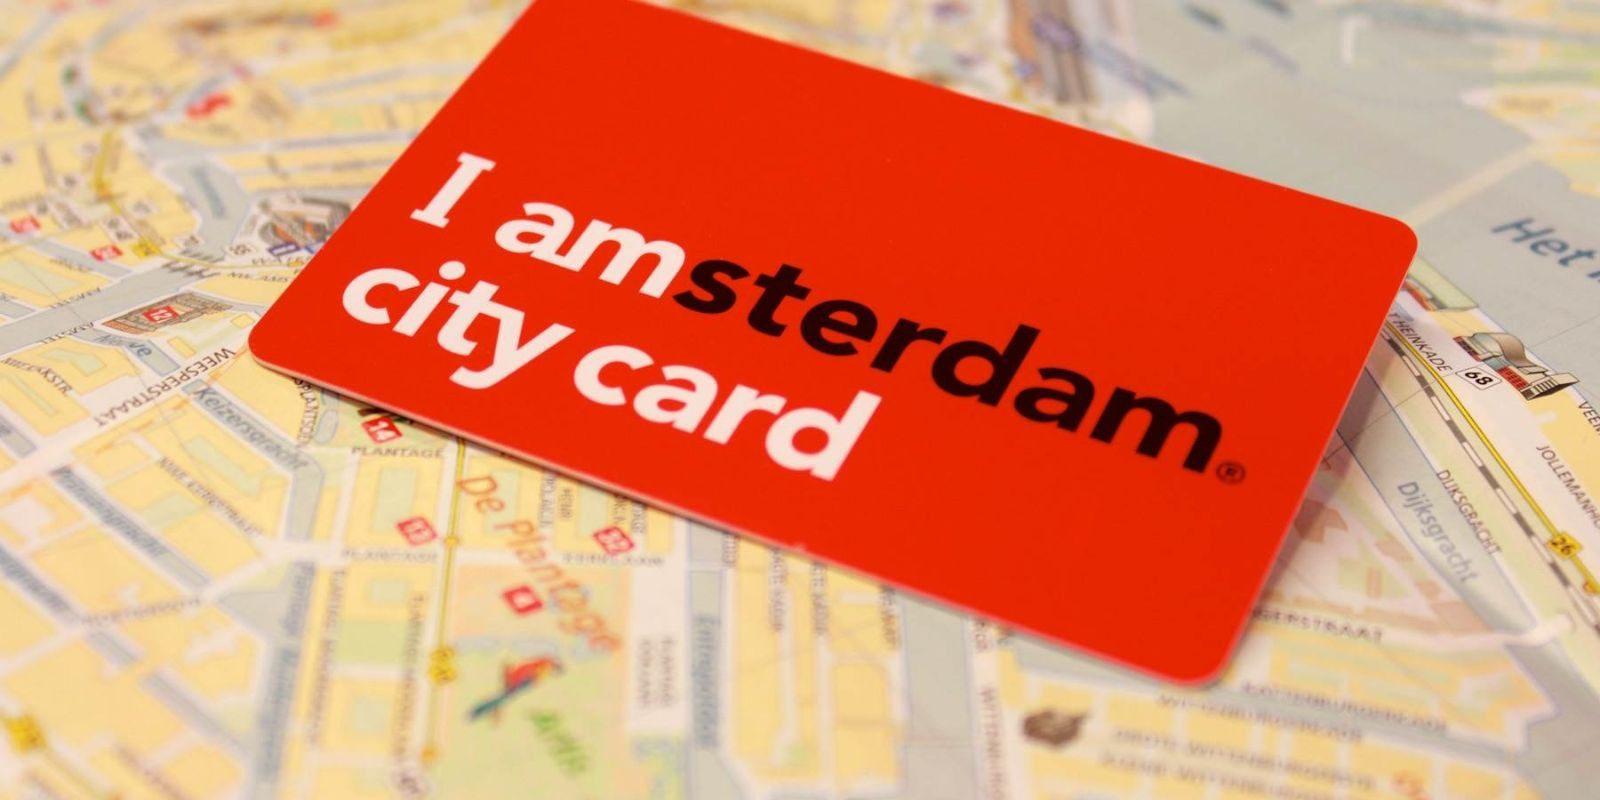 amsterdam museum passes iamsterdam card